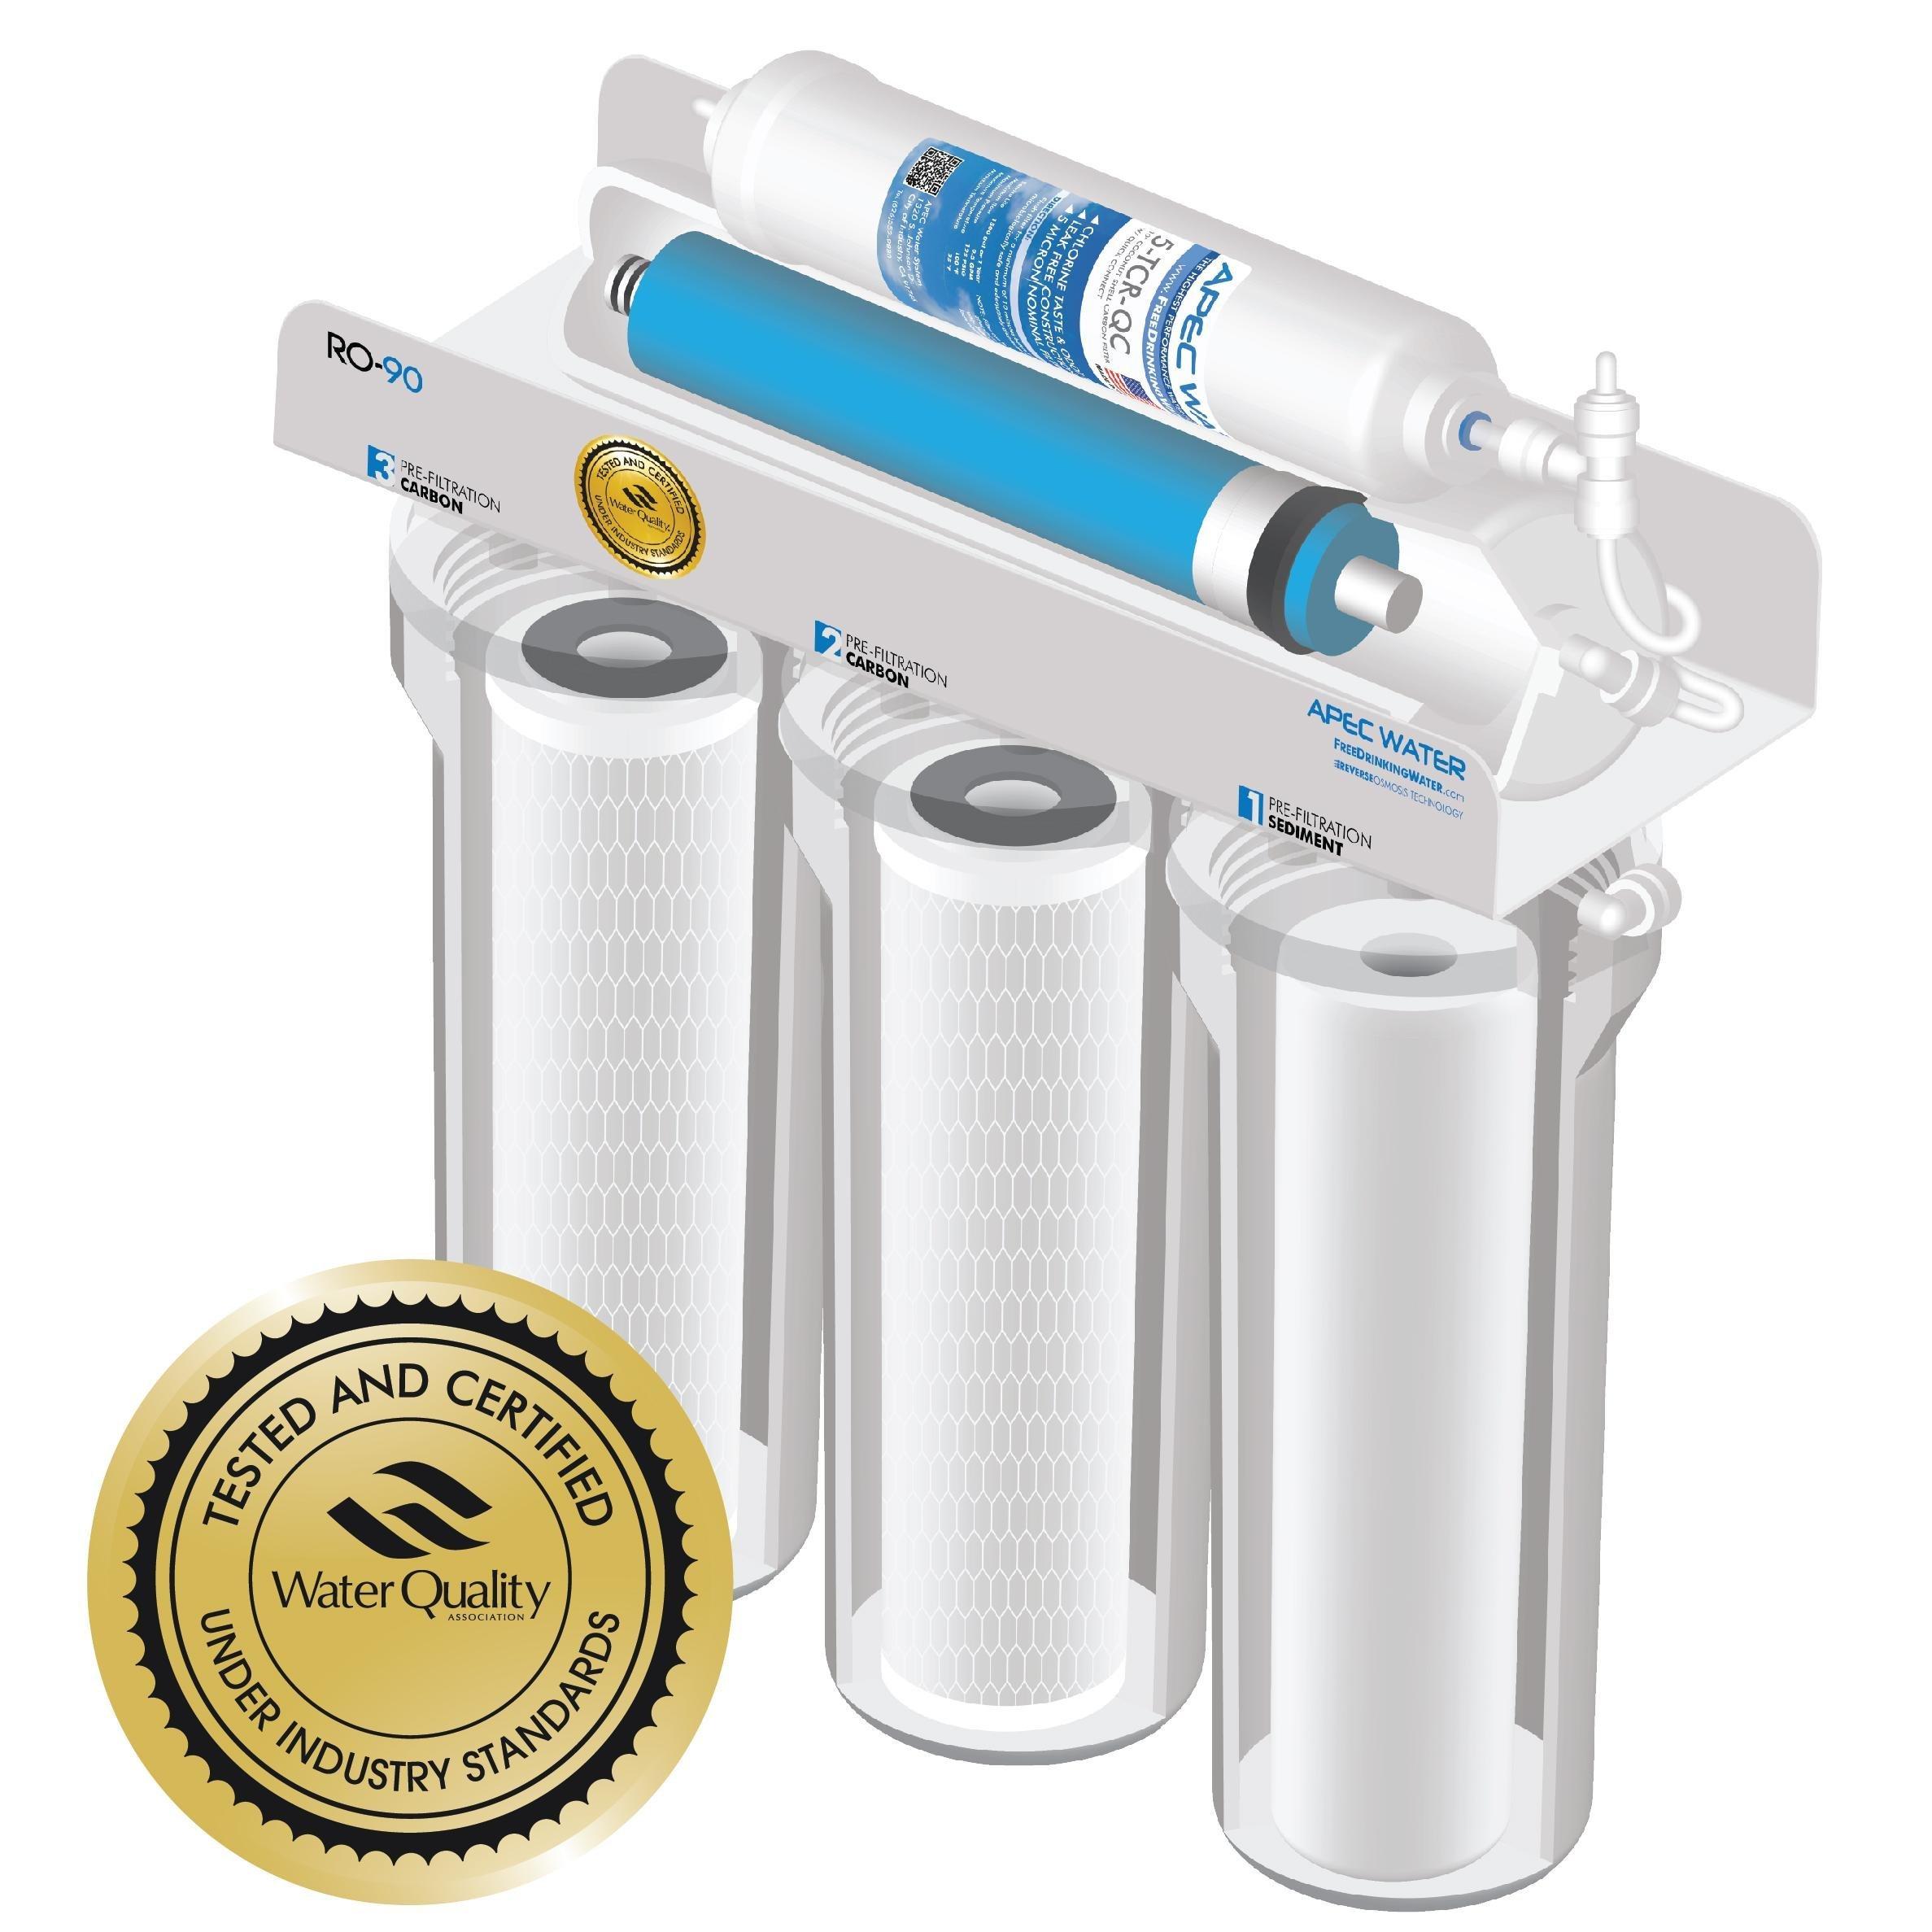 Apec Water Top Tier Built In Usa Certified Ultra